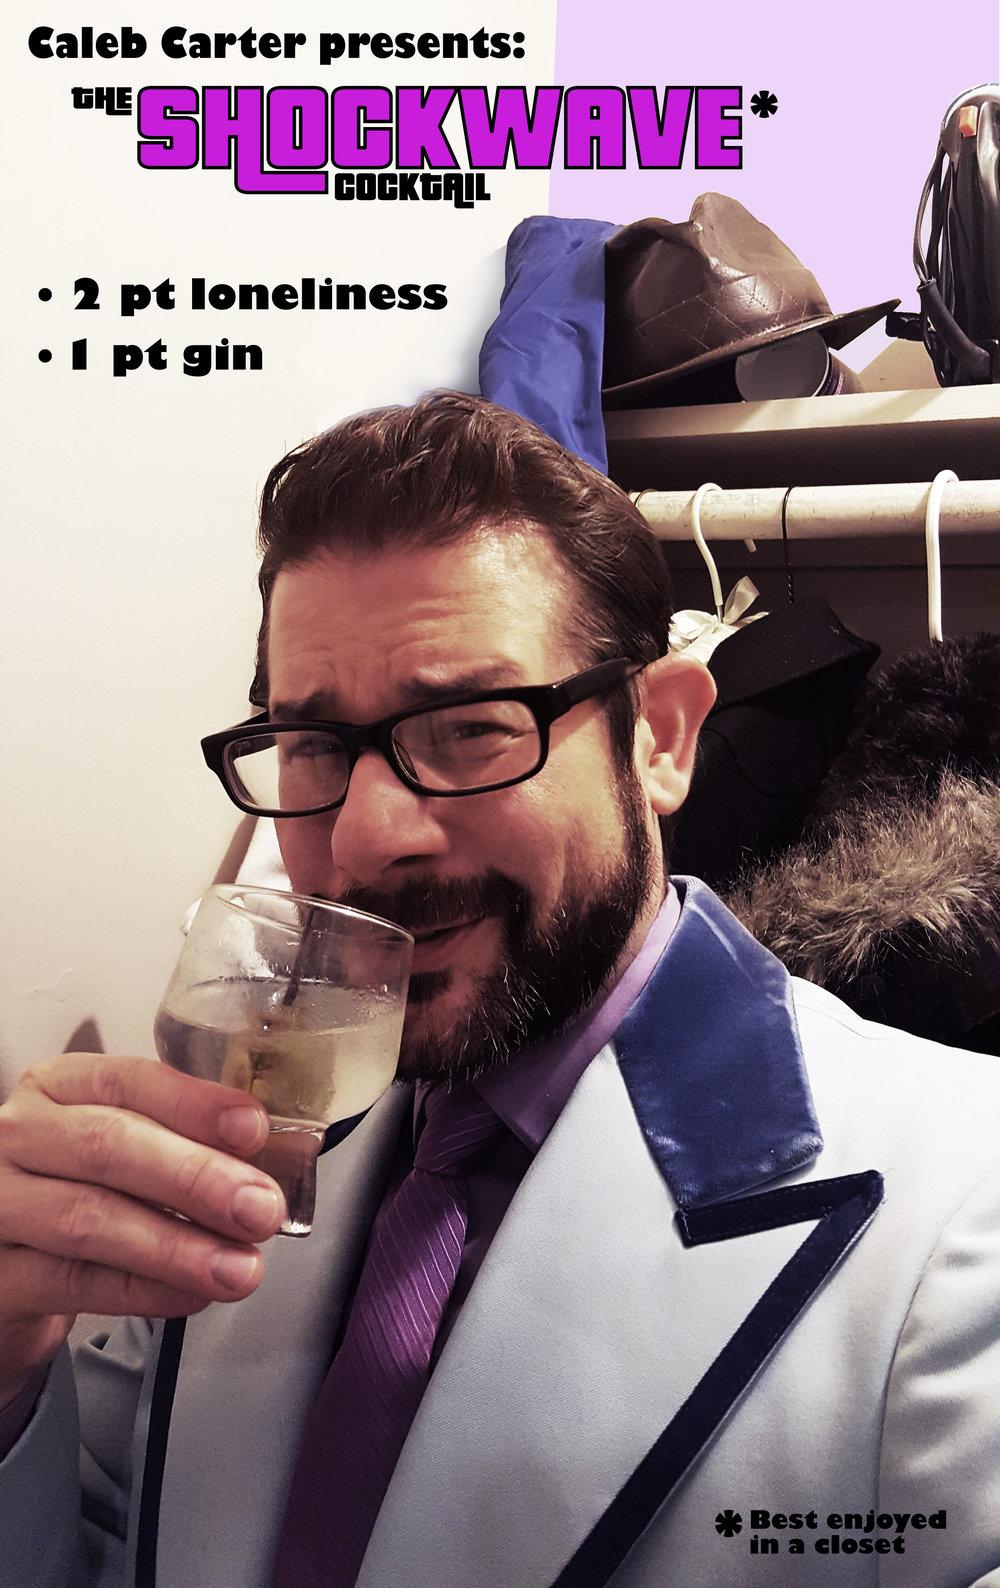 Ryan_Shockwave_Cocktail.jpg